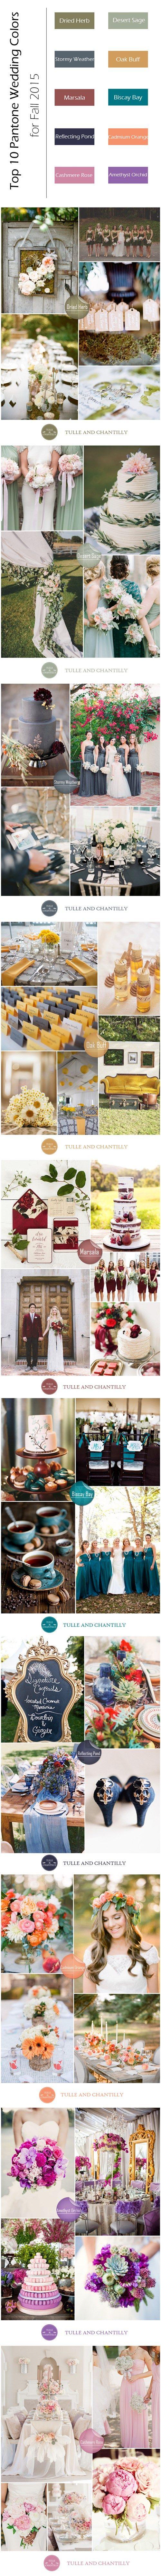 Fall wedding ideas - Top 10 Pantone Inspired Fall Wedding Colors 2015